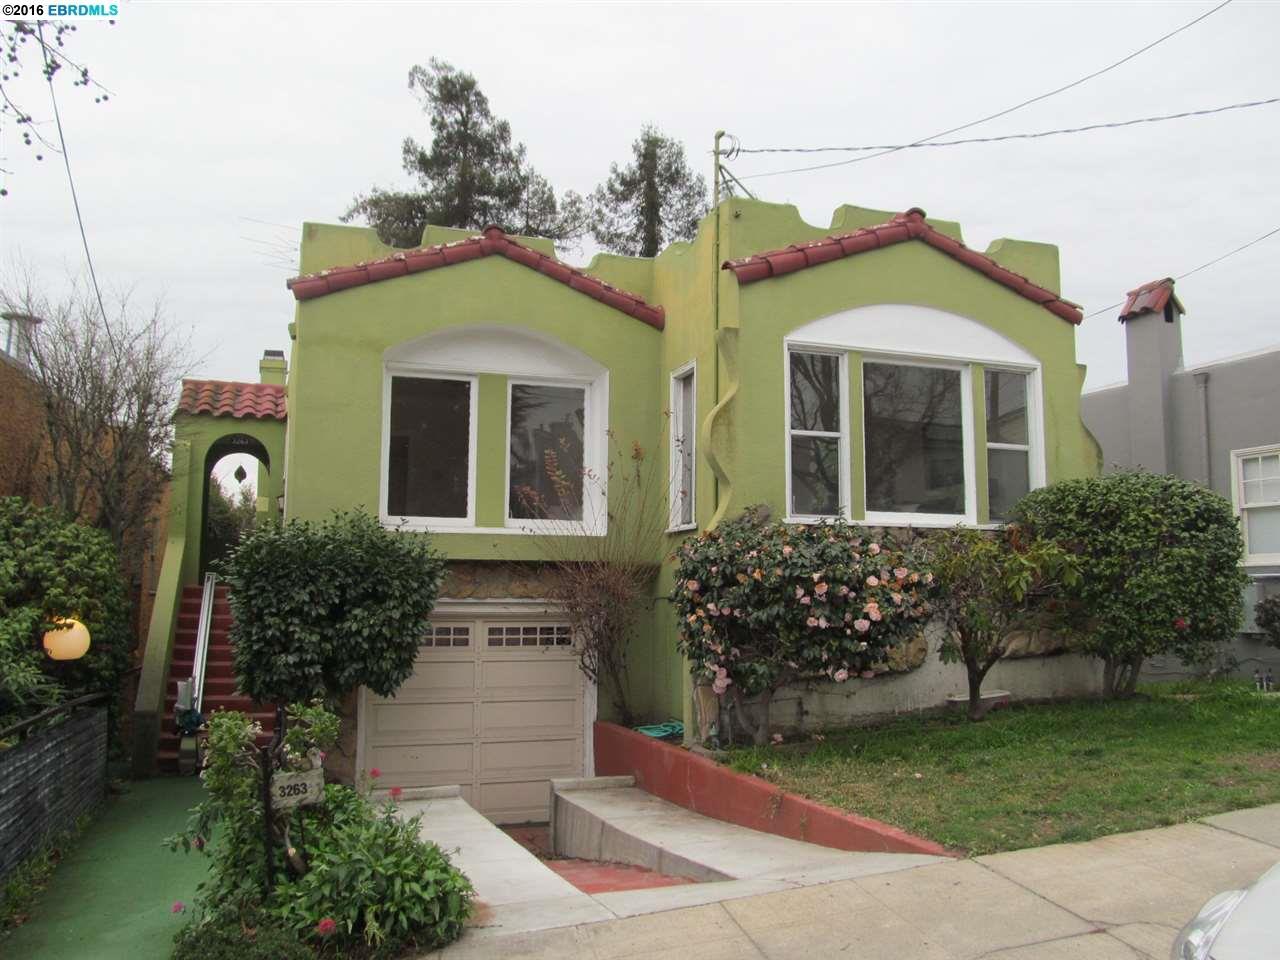 3263 Madera Ave, Oakland, CA